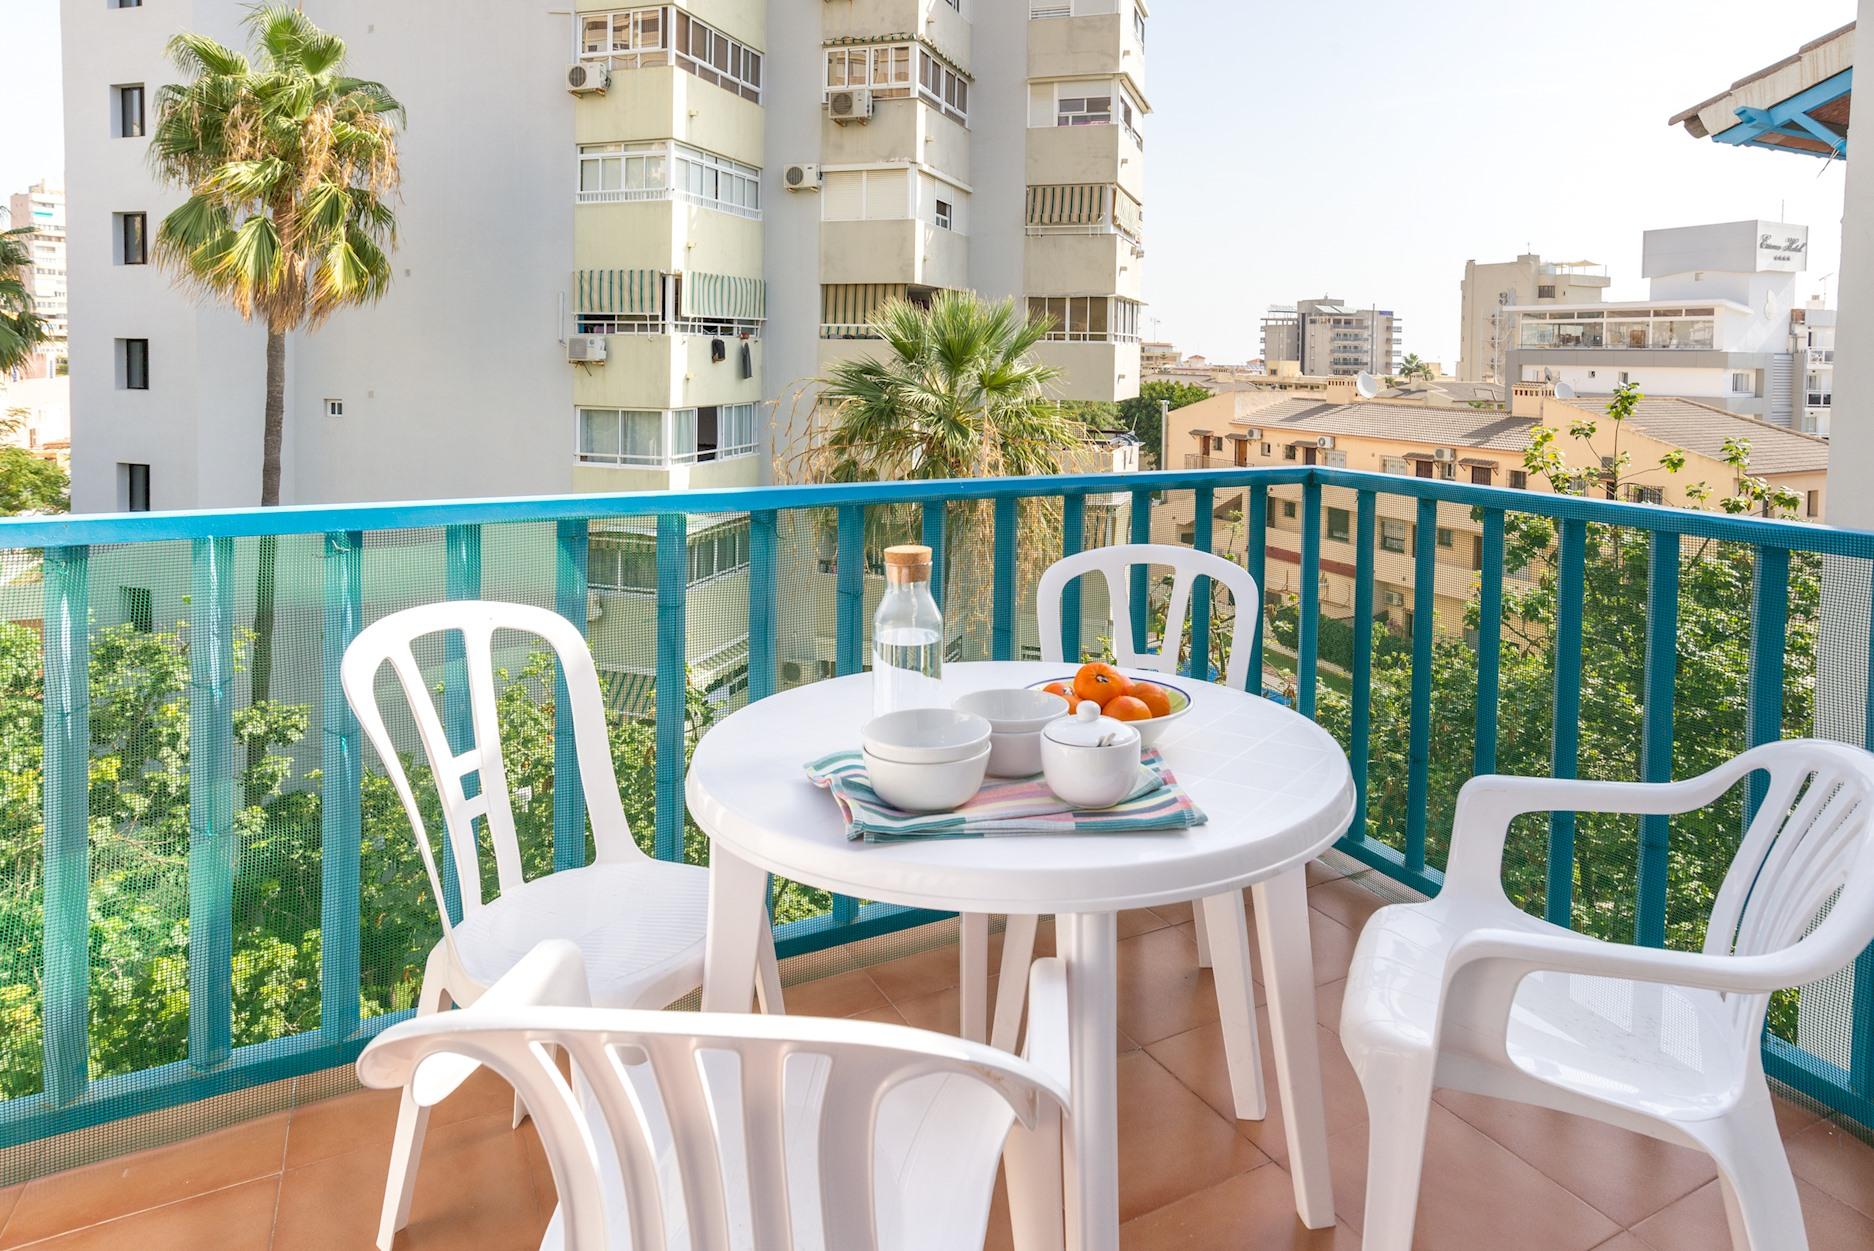 Apartment MalagaSuite Lux Beach   Pool photo 20147419